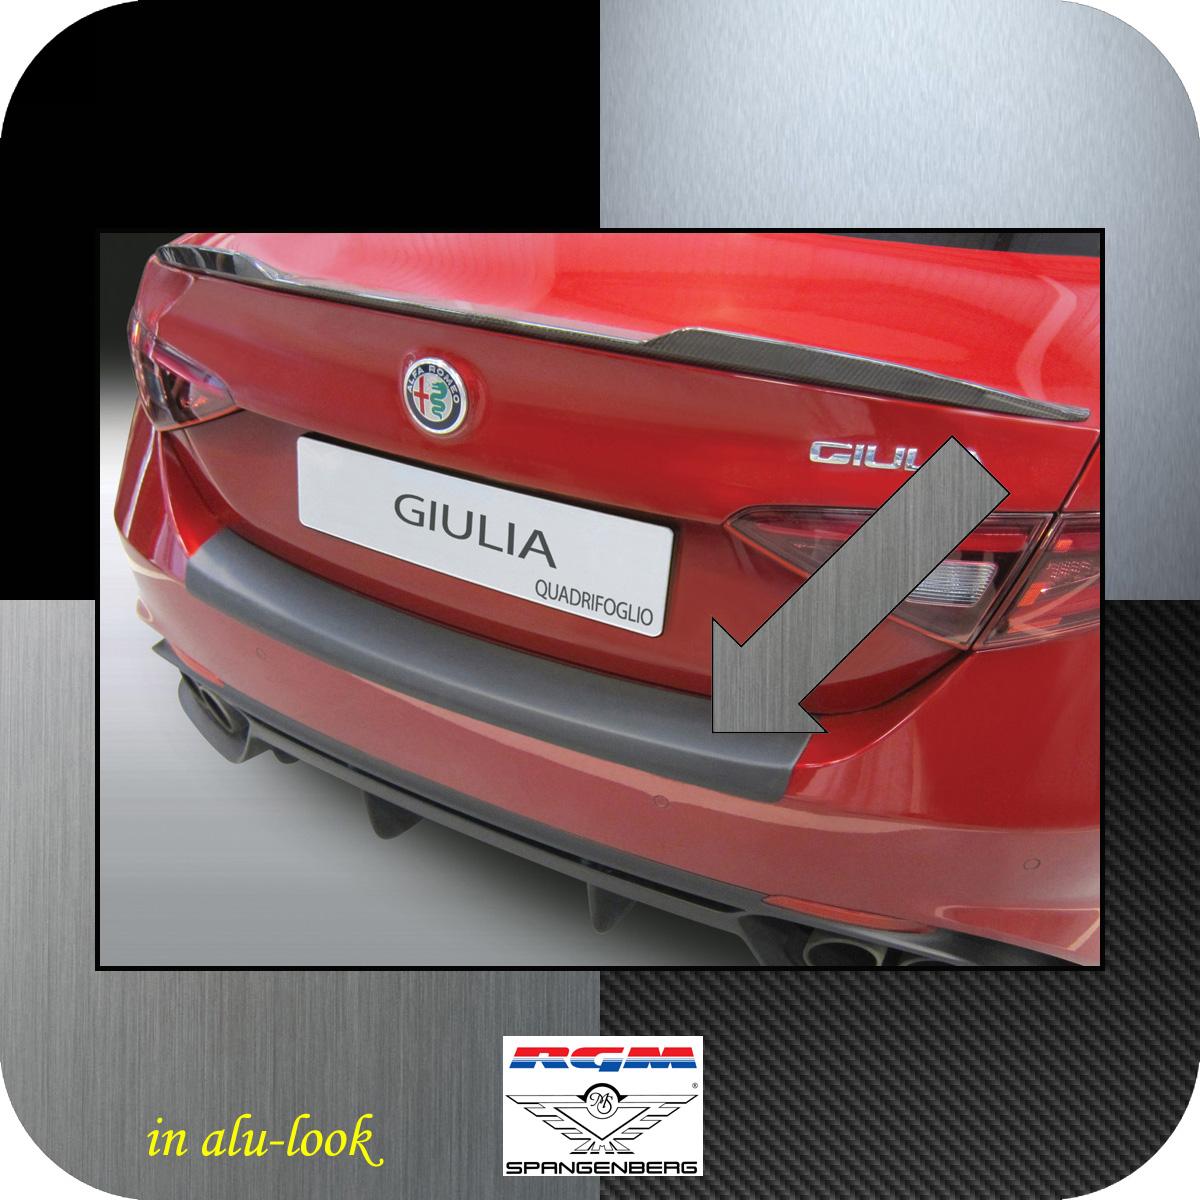 Ladekantenschutz Alu-Look Alfa Giulia Limo 952 nur Quadrifoglio 05.2016- 3504677